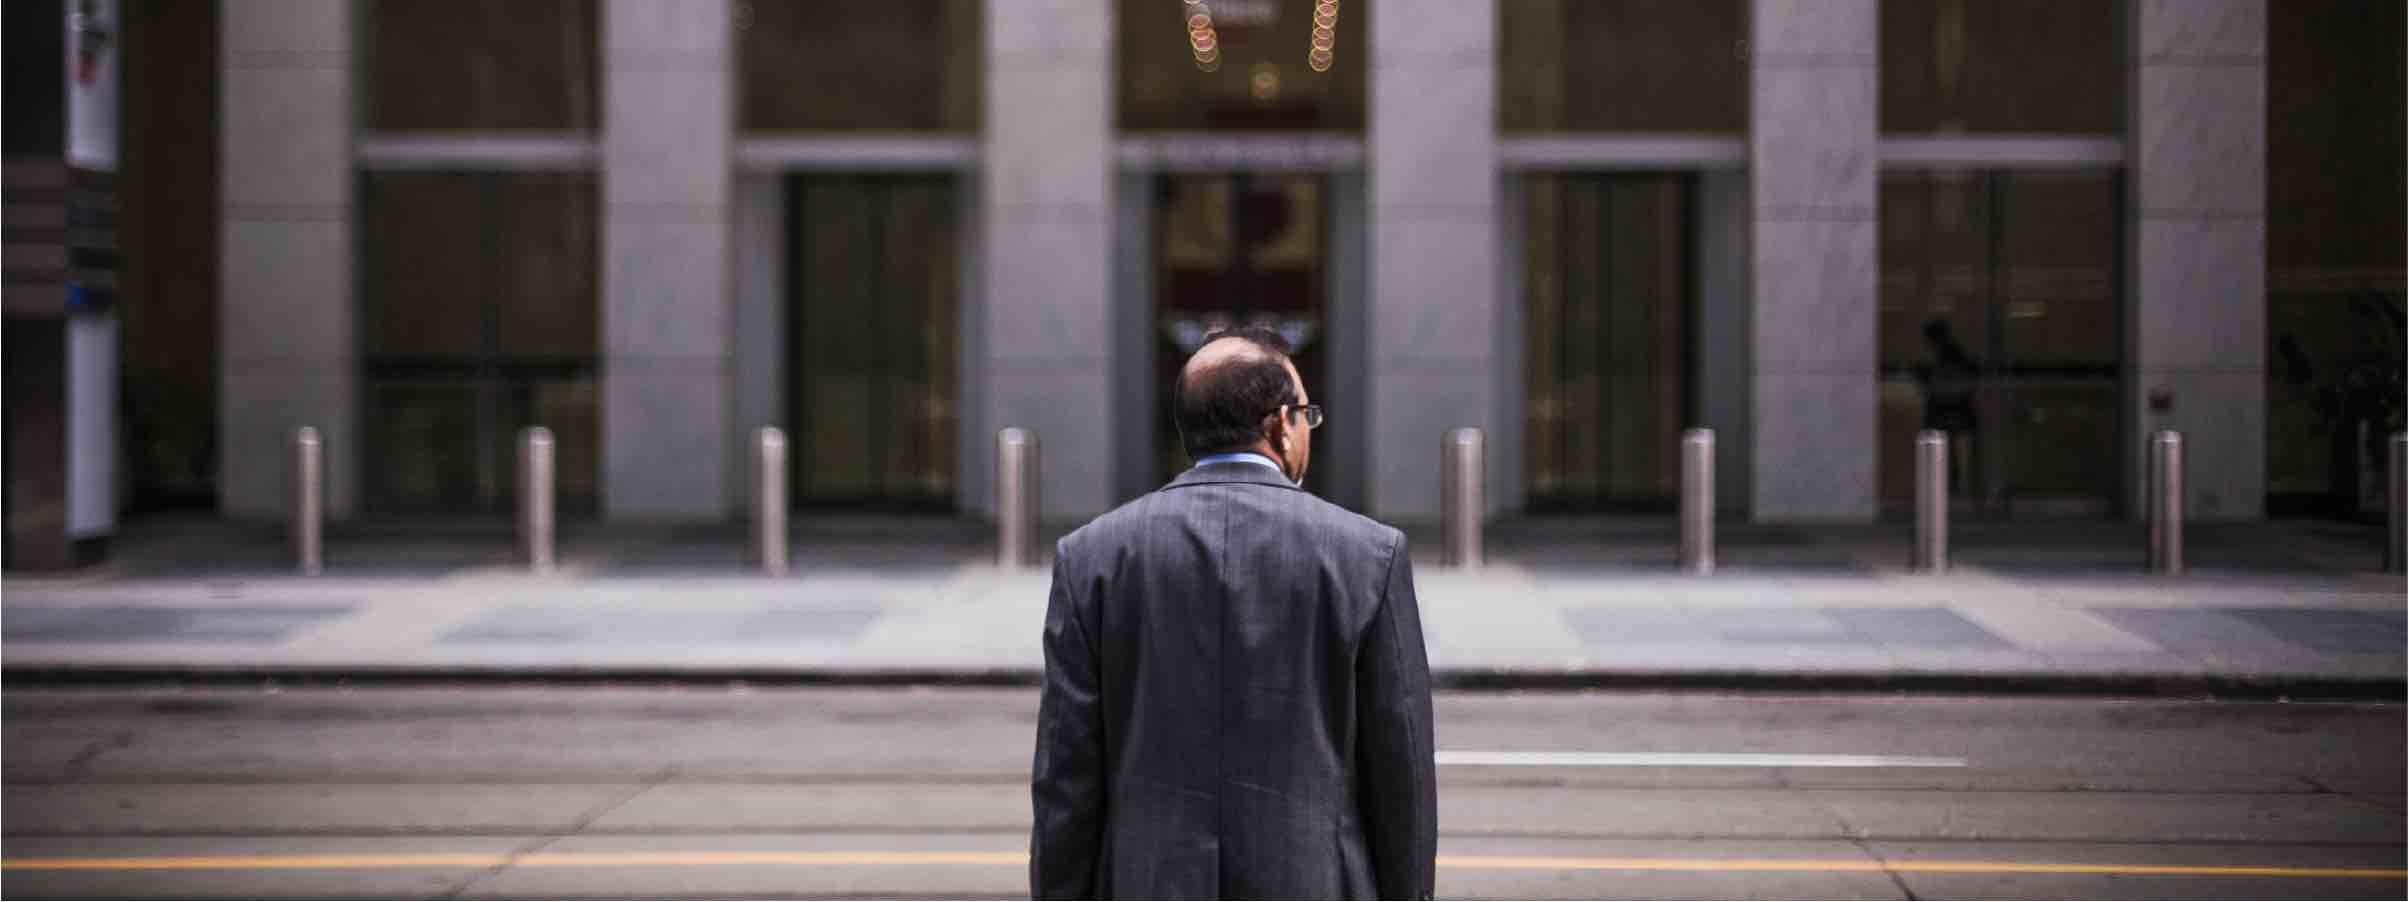 Specialister i B2B-telemarketing med mere end 27 års erfaring.